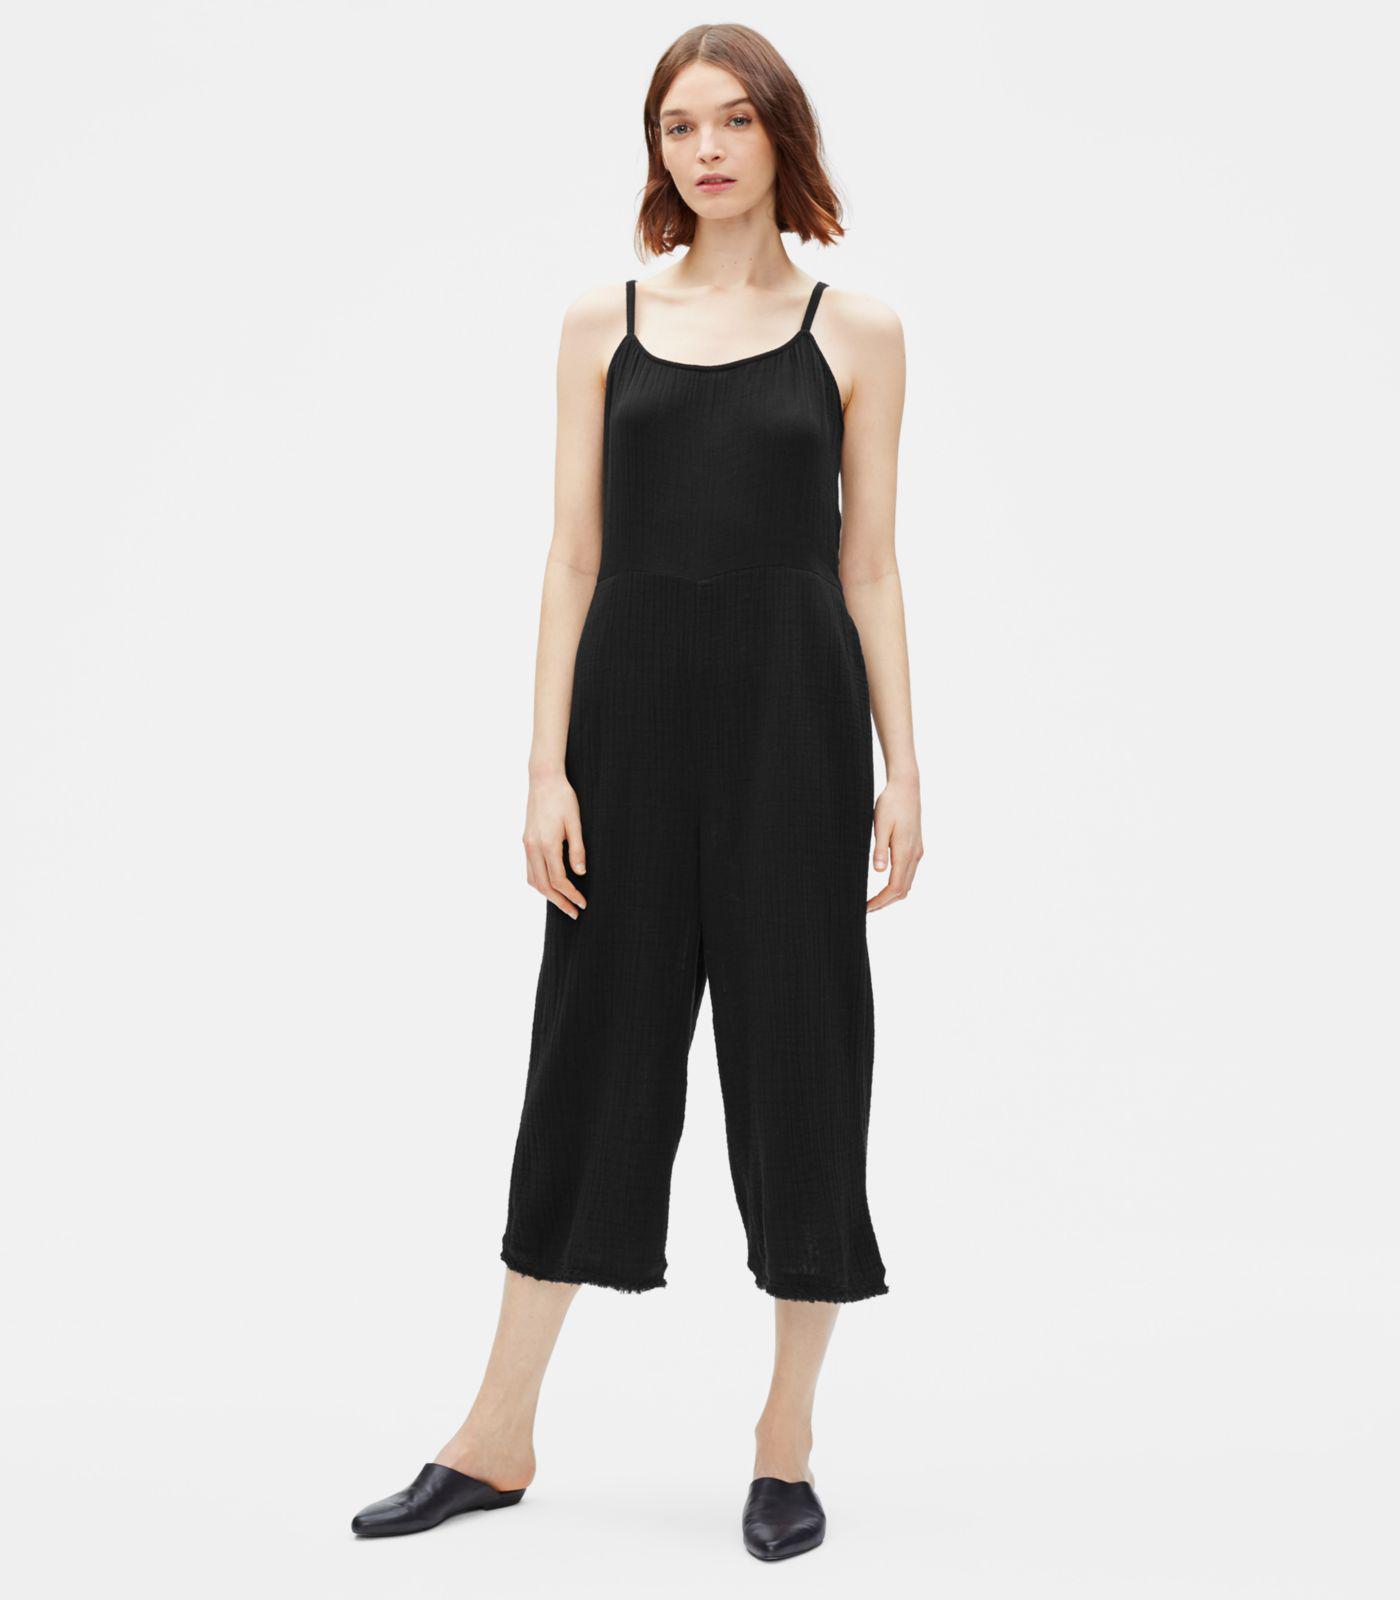 71e788ddda7 Lyst - Eileen Fisher Organic Cotton Gauze Jumpsuit in Black